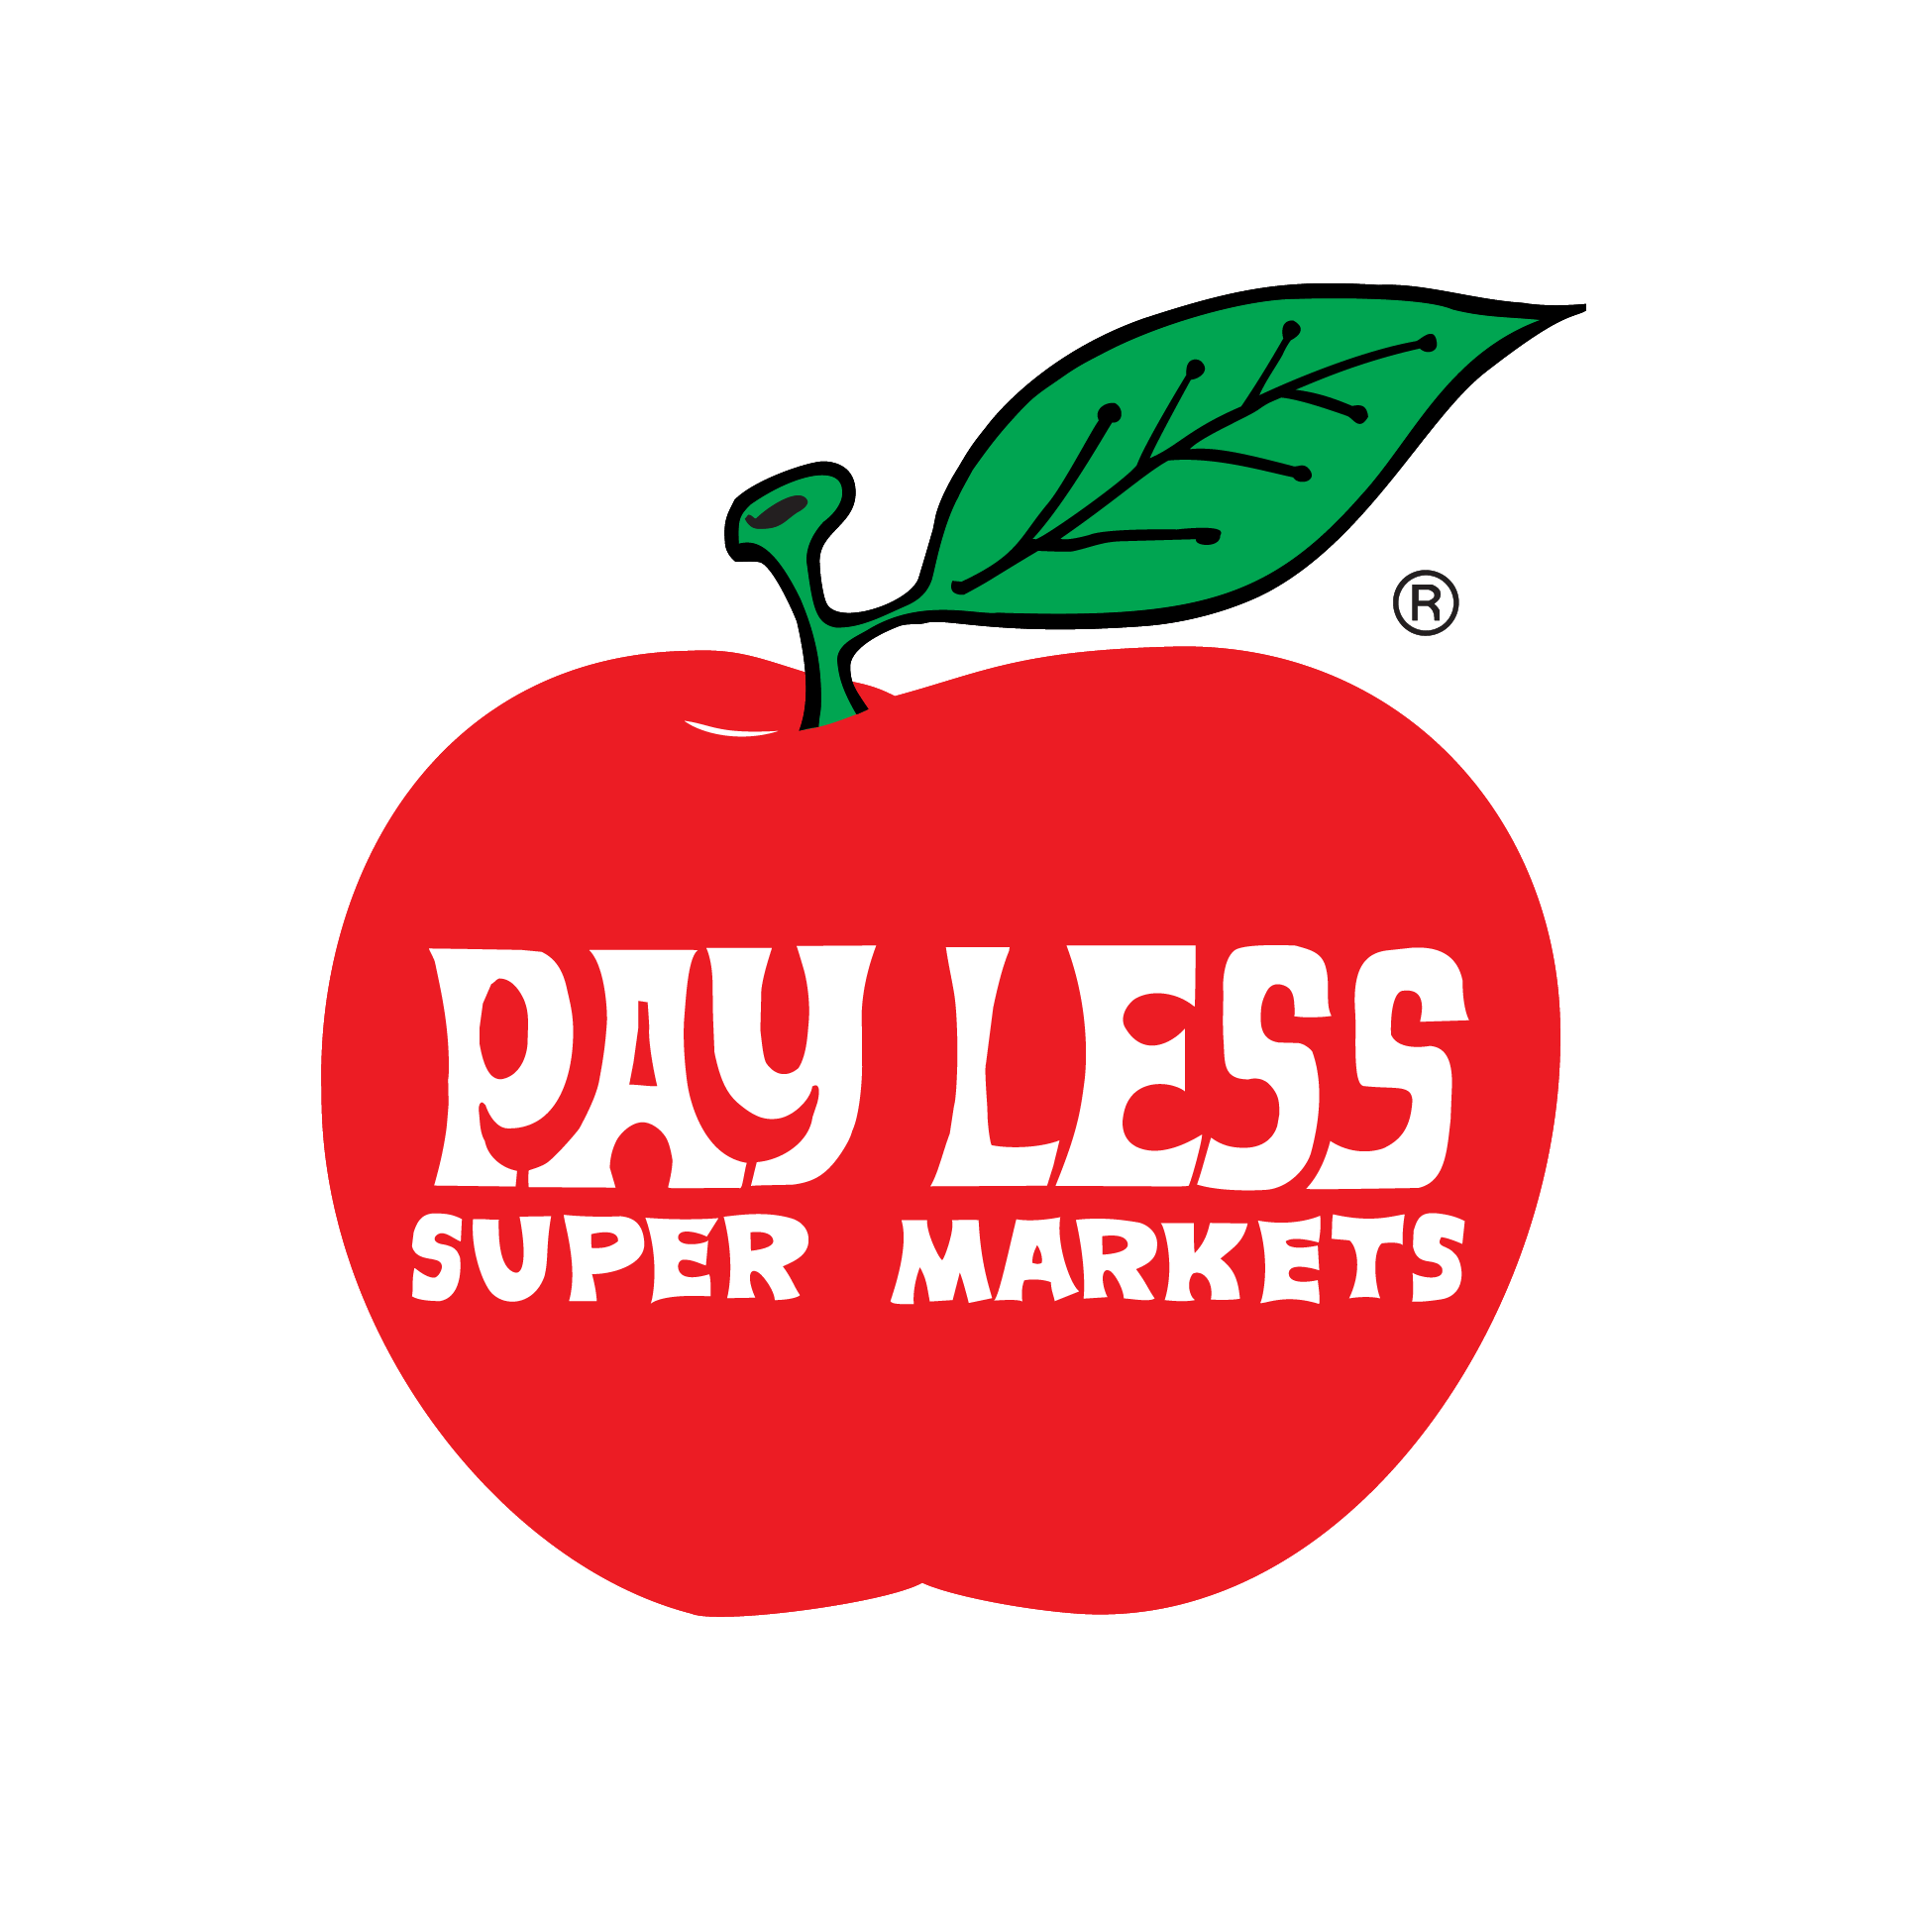 Pay Less logo